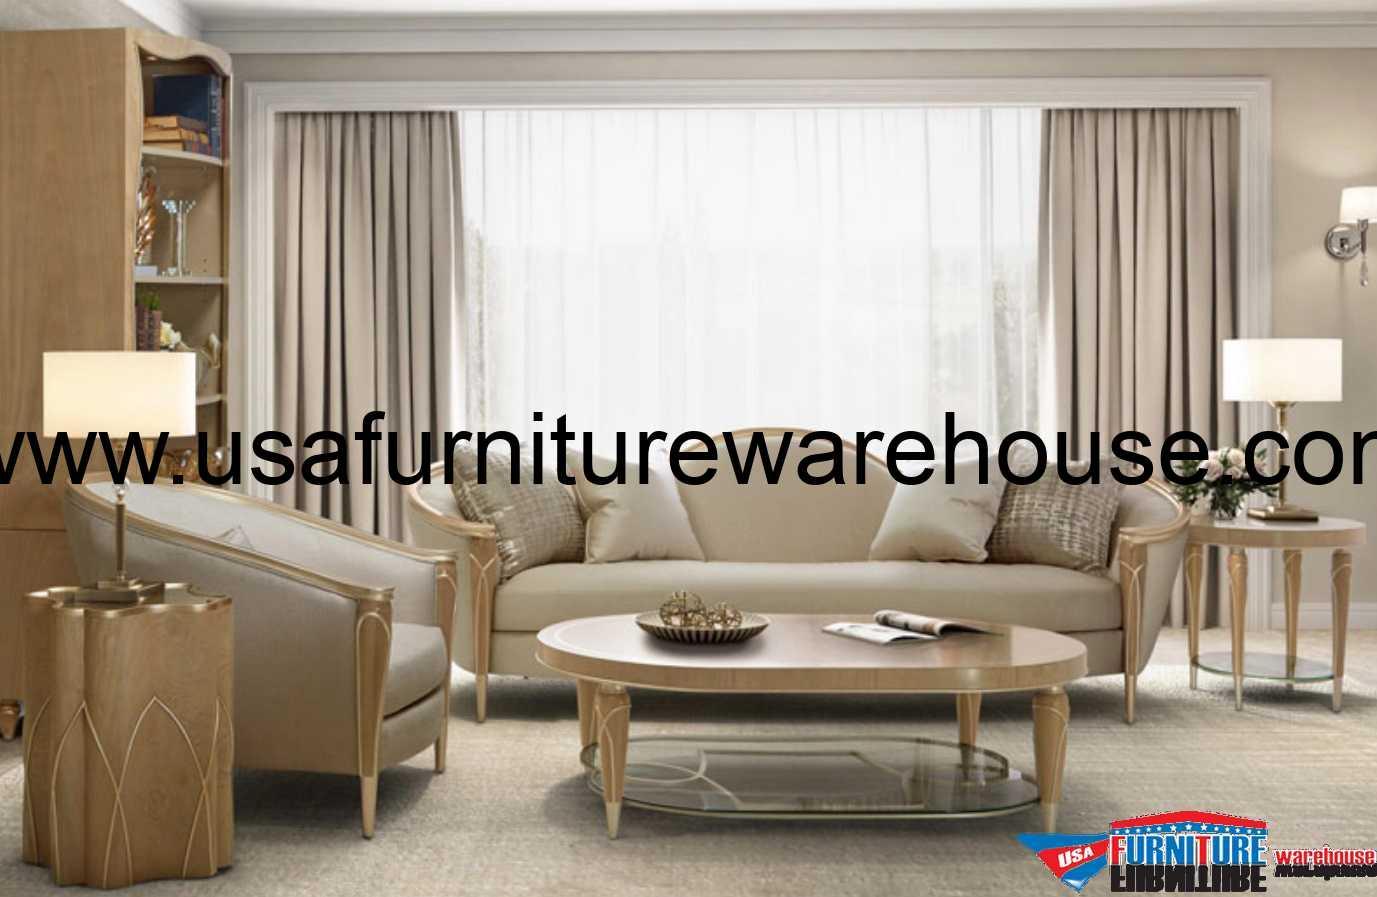 Aico Villa Cherie Sofa Caramel 9008815 Pearl 134 Usa Furniture